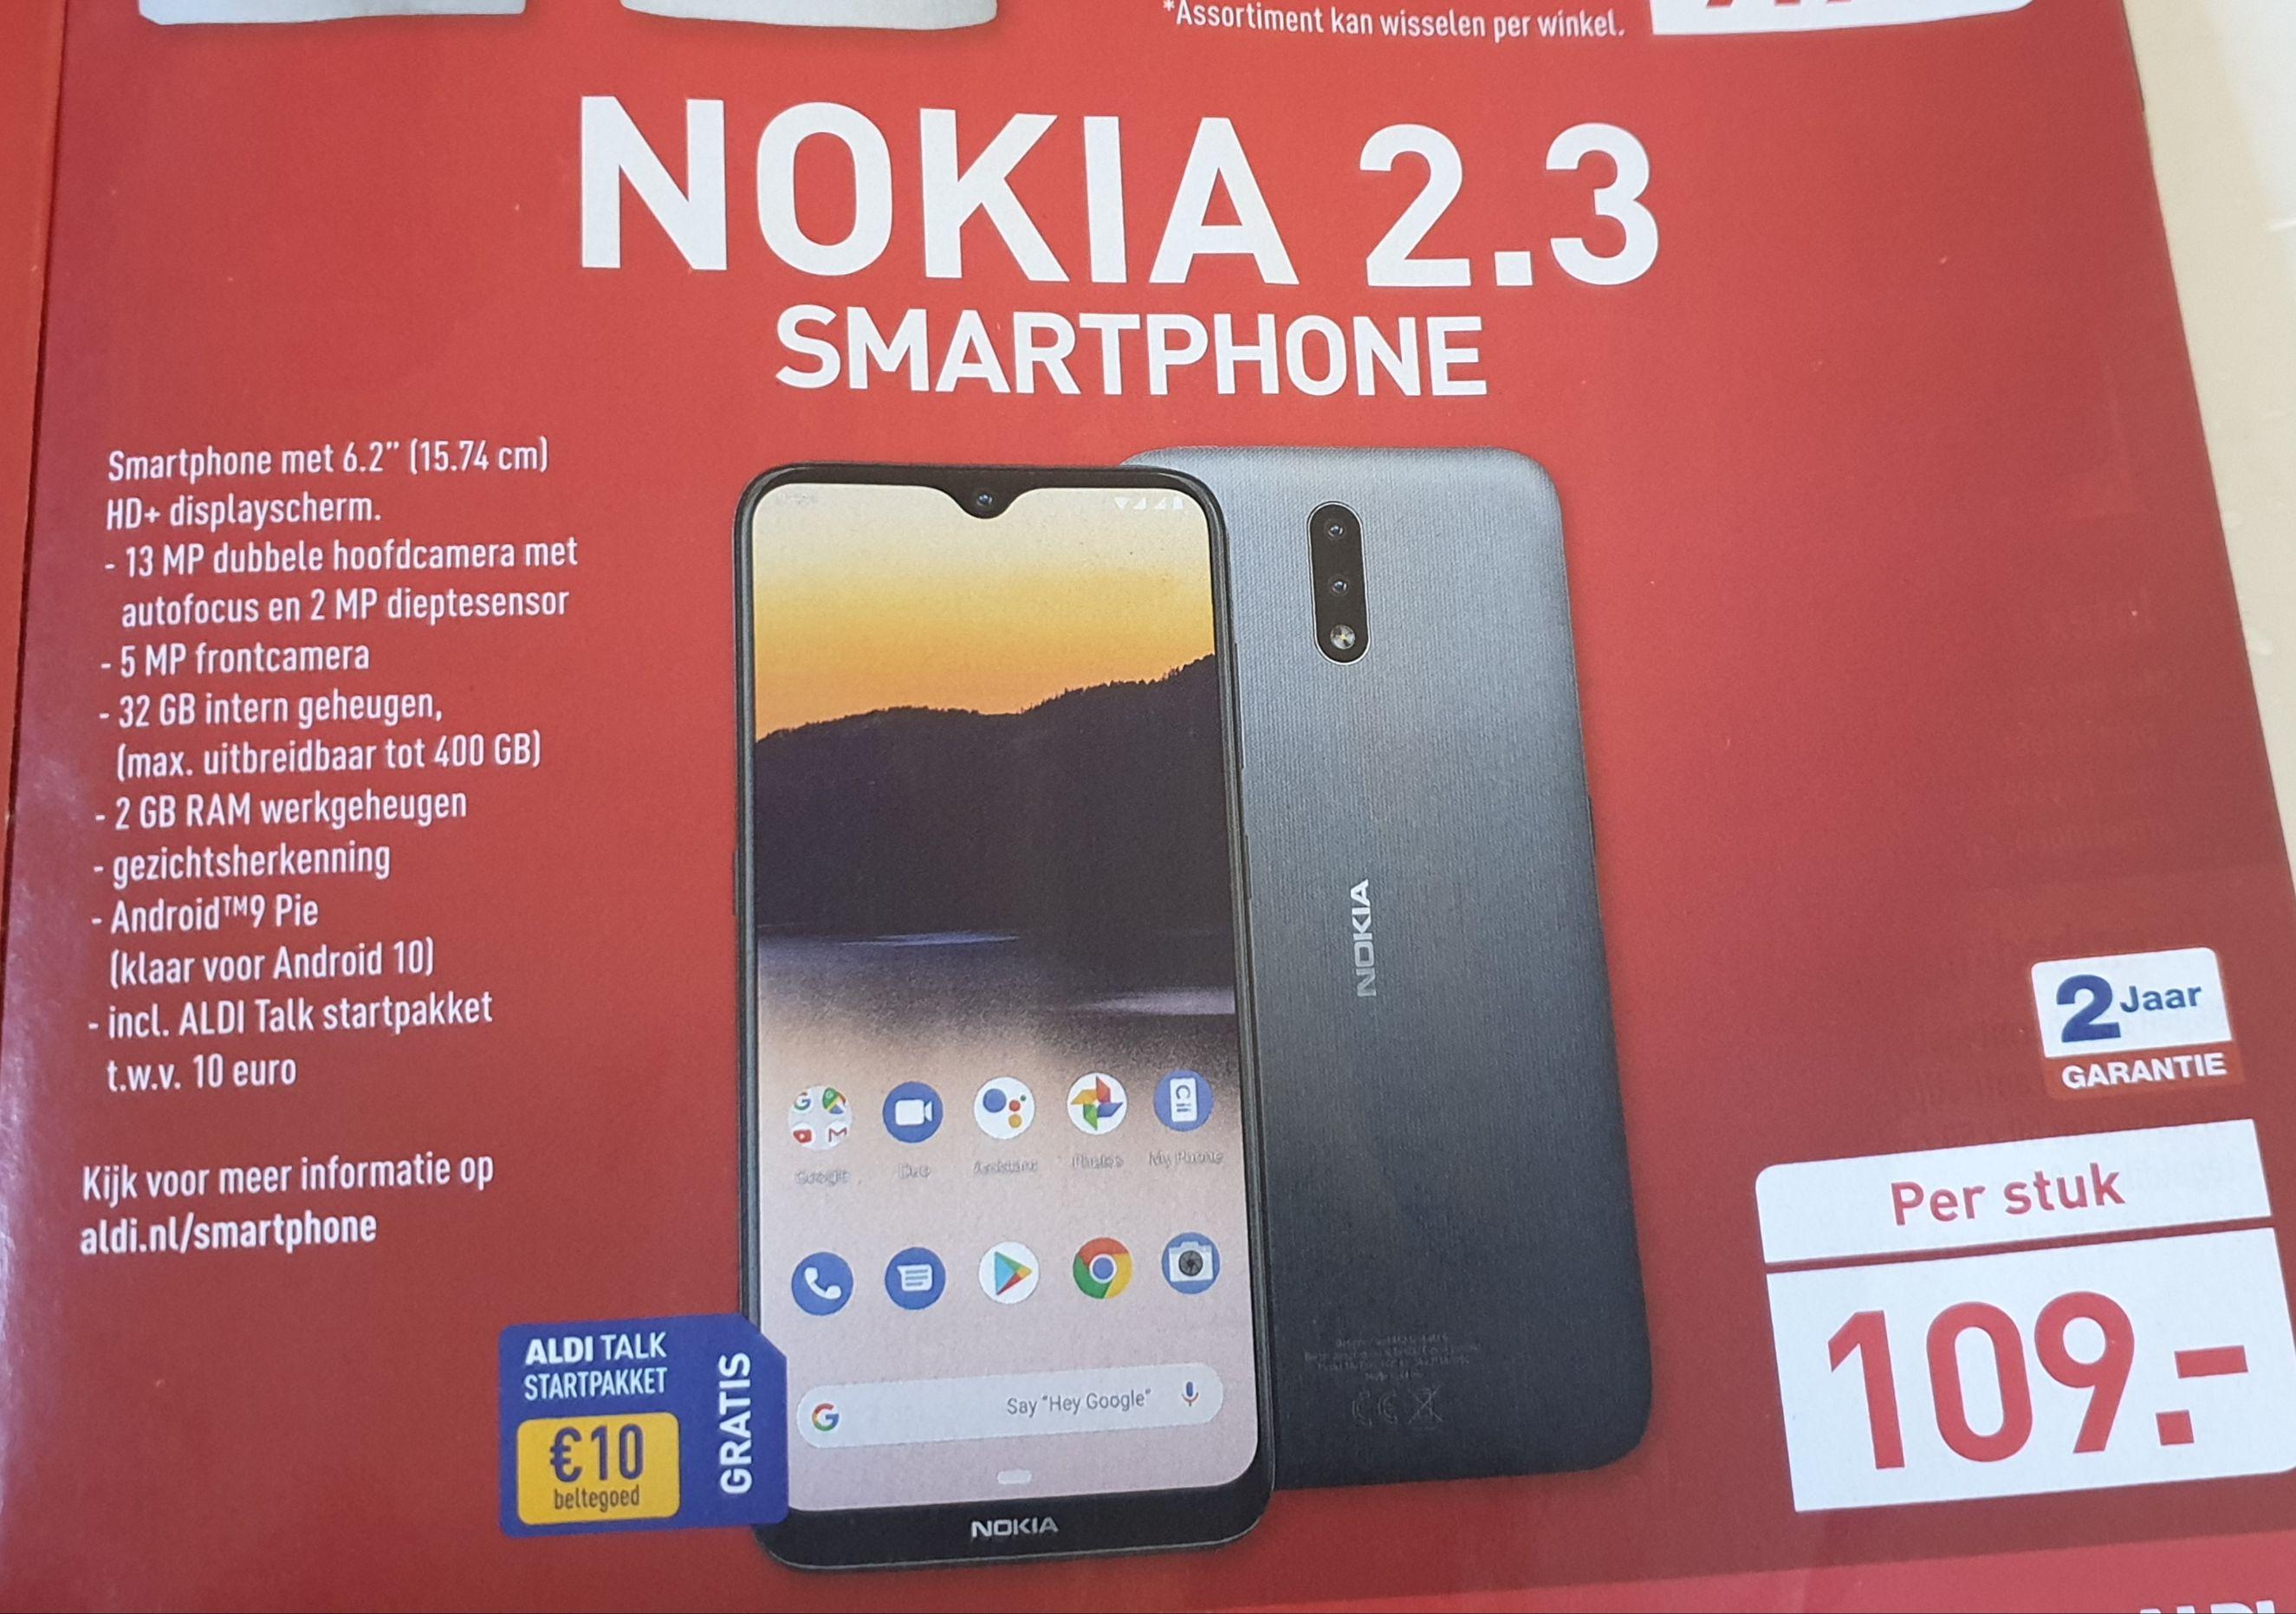 Nokia 2.3 bij Aldi vanaf 06 juni